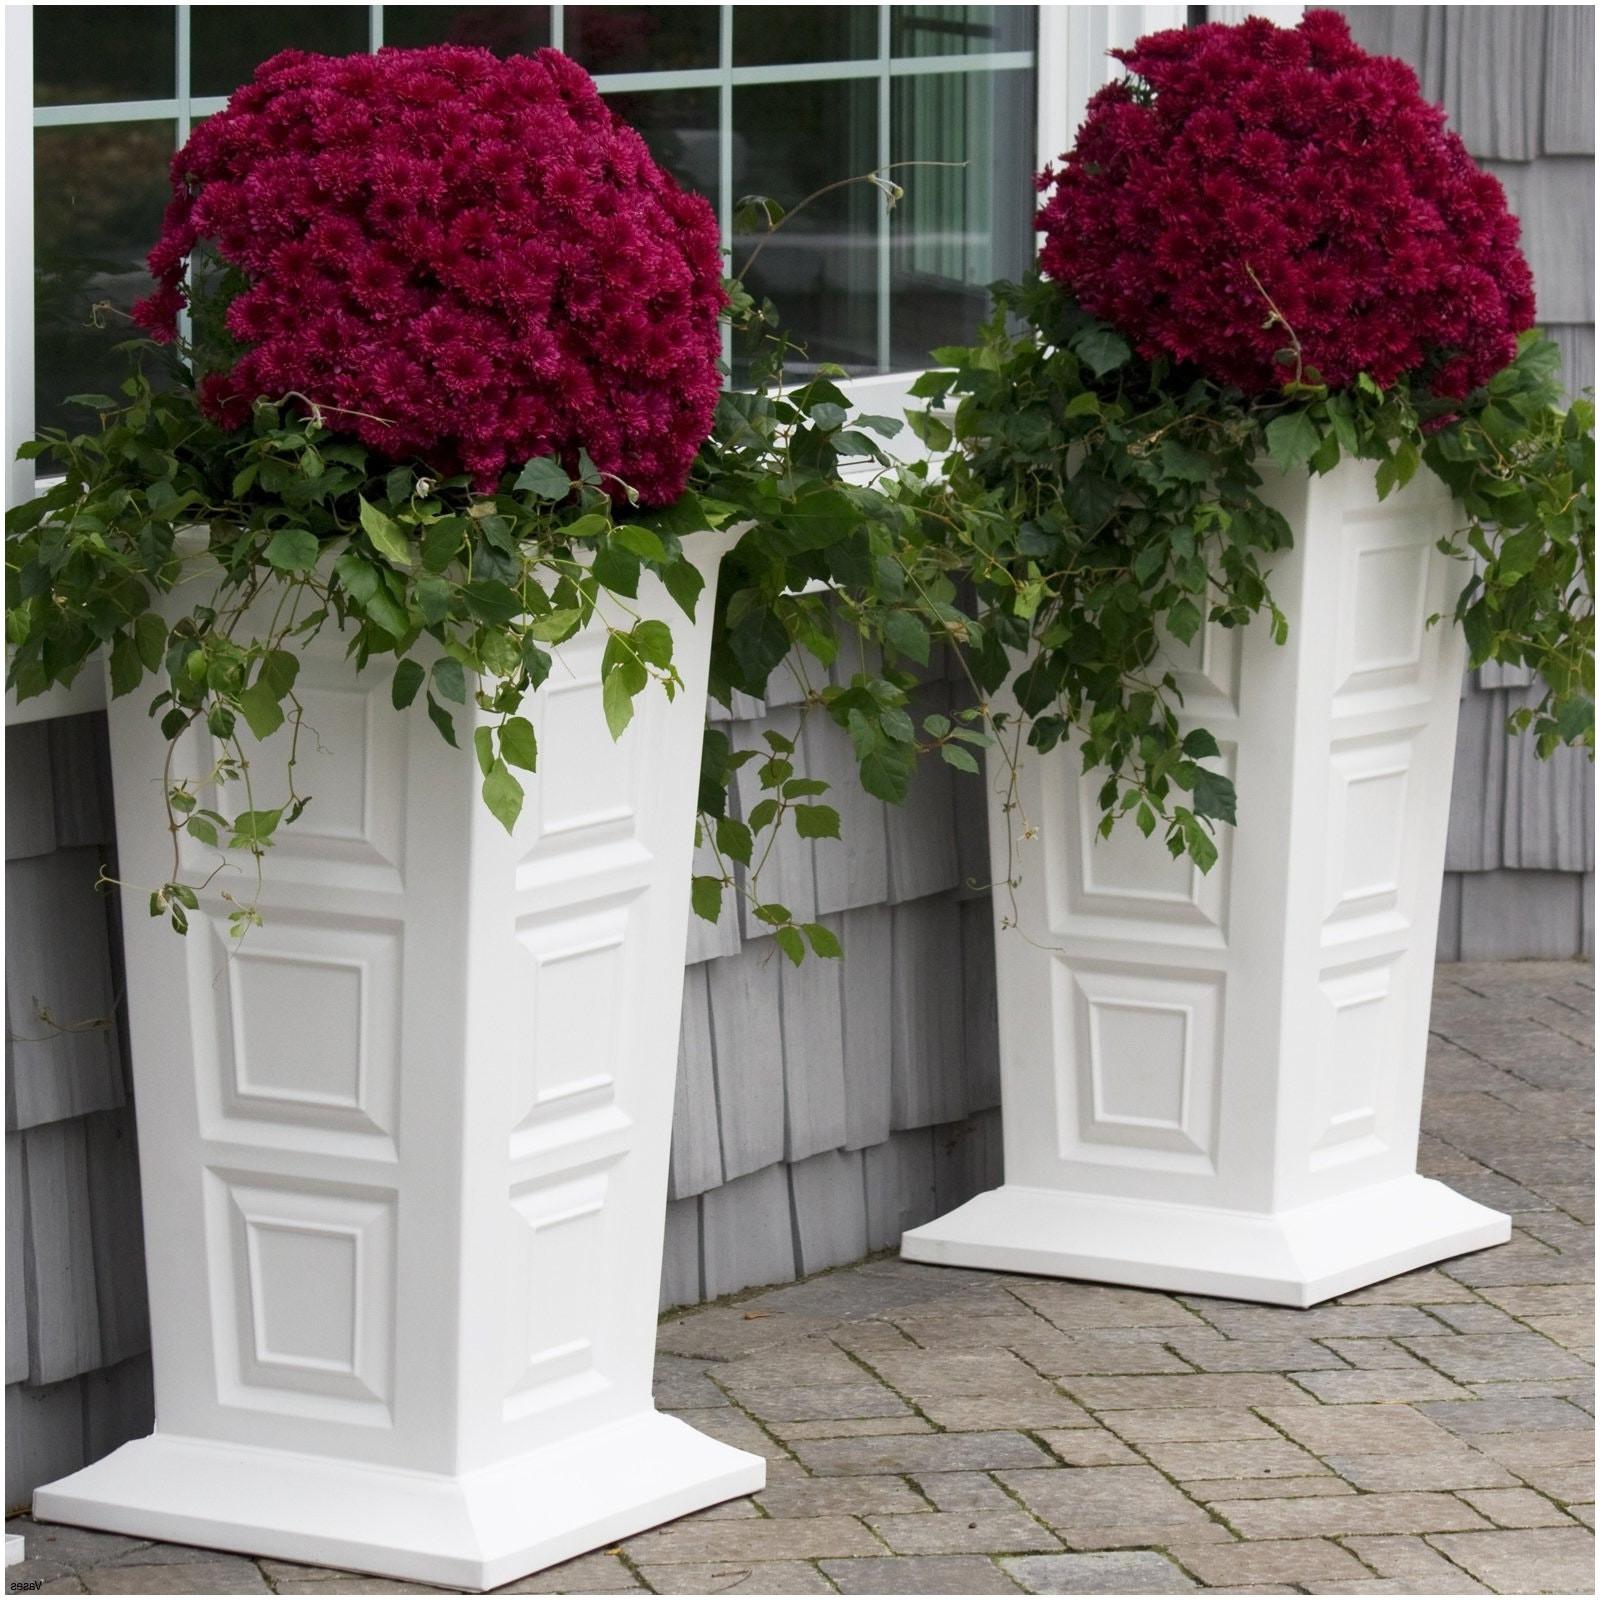 tube flower vase of 17 beau pot decoratif anciendemutu org within extra round outdoor planter pot xl5h vases i 0d cheap design ideas decorative flower pots